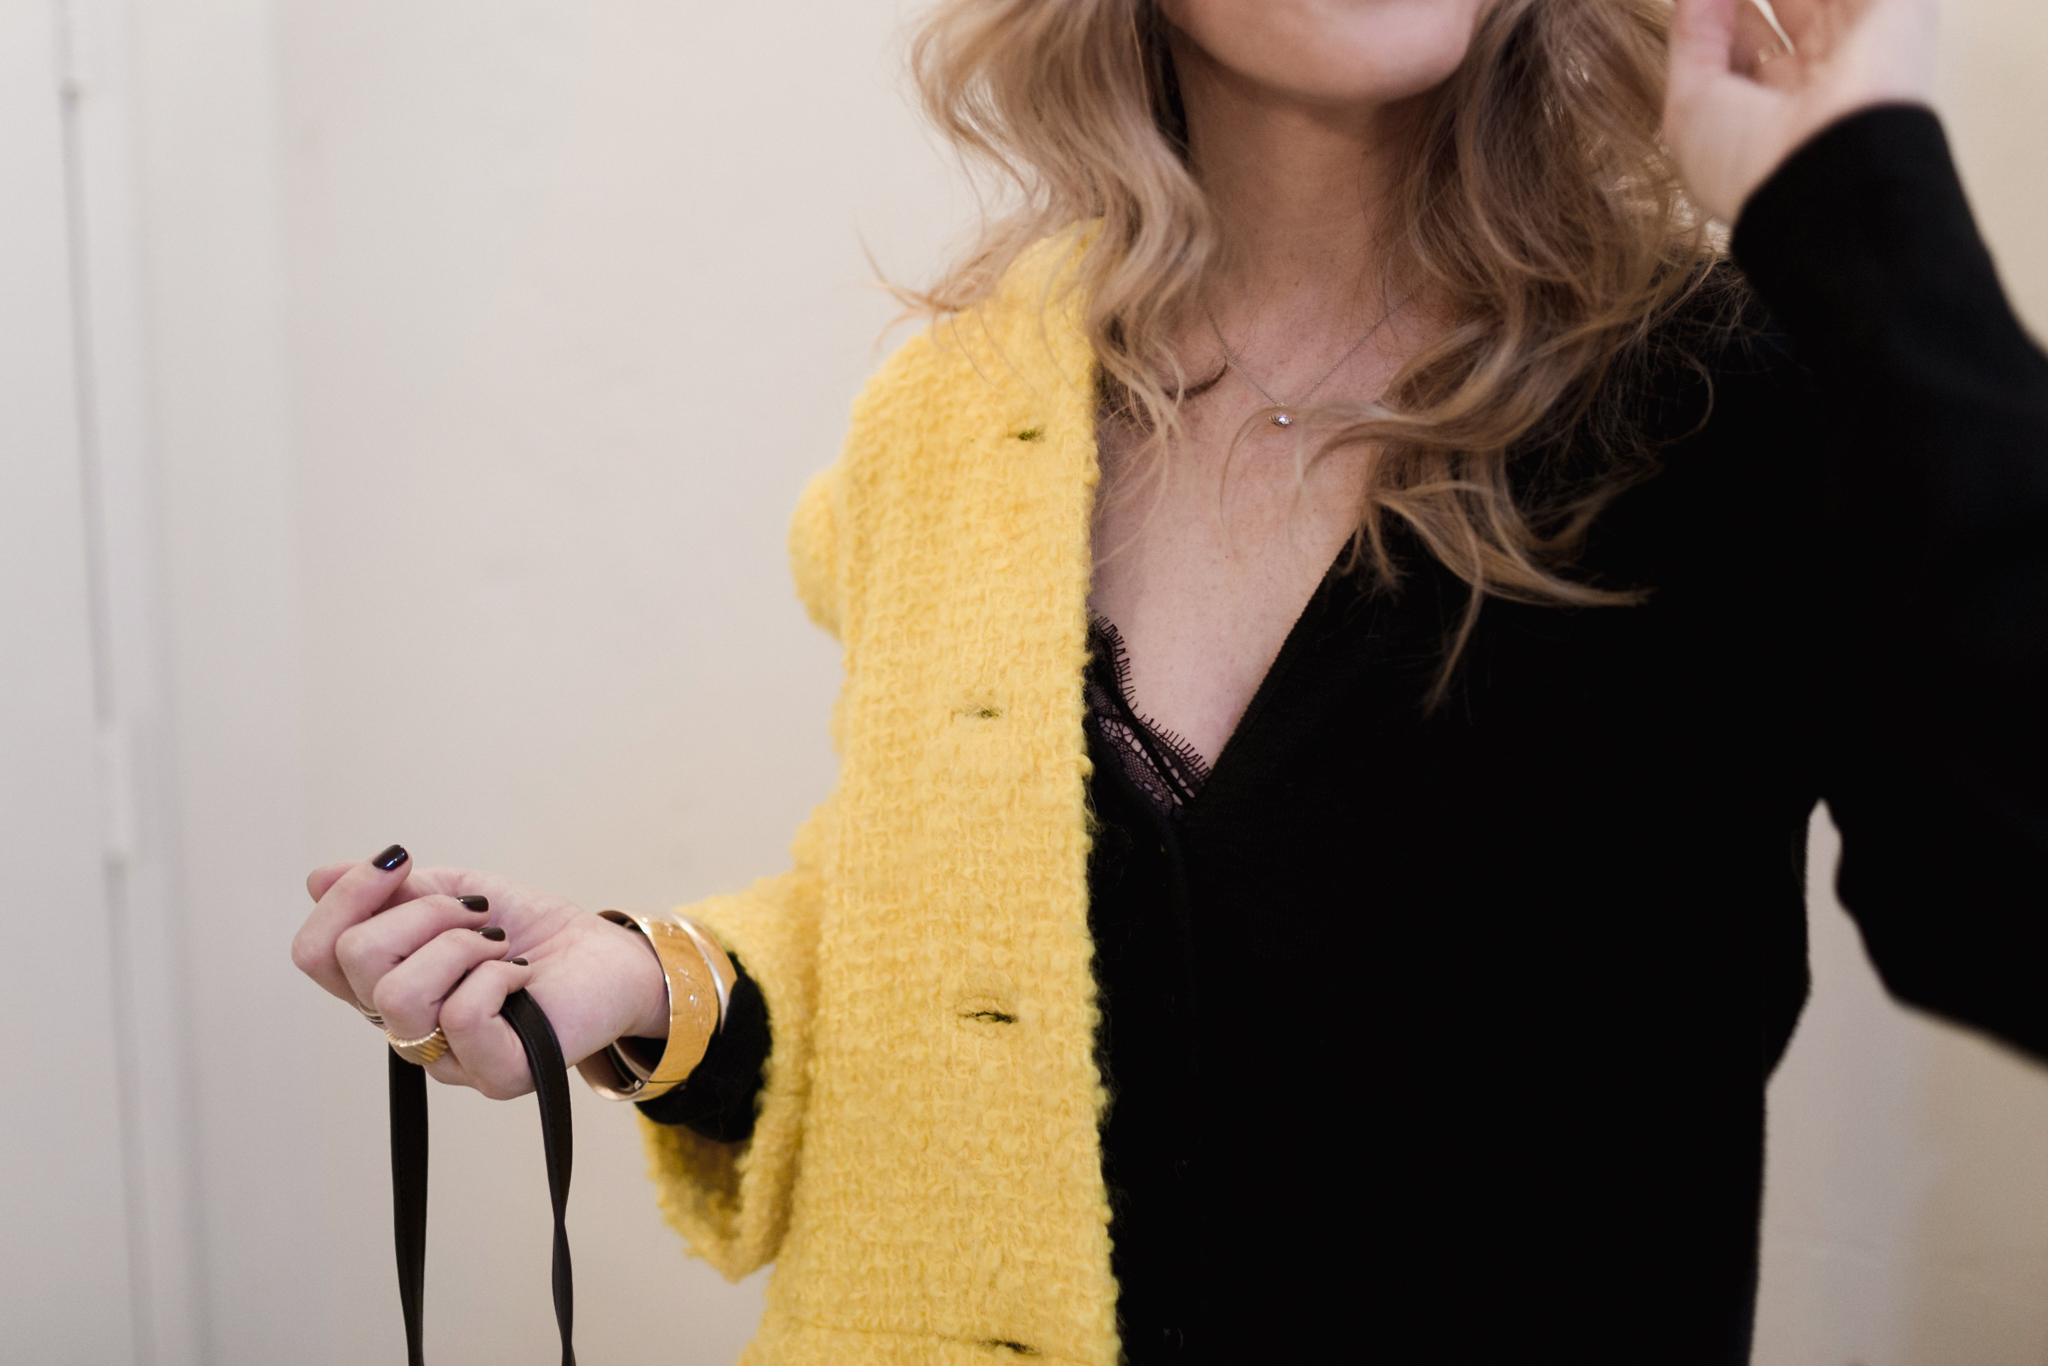 Eldridge Edit_Anna_E_Cottrell_Fashion_Blogger_Yellow_Vintage_Coat_Wrangler_Boyfriend_Jeans_Spring_Trend_2017_Star_Crossbody_Bag_Socks_with_Heels_Trend_MGB_Photo_11.jpg